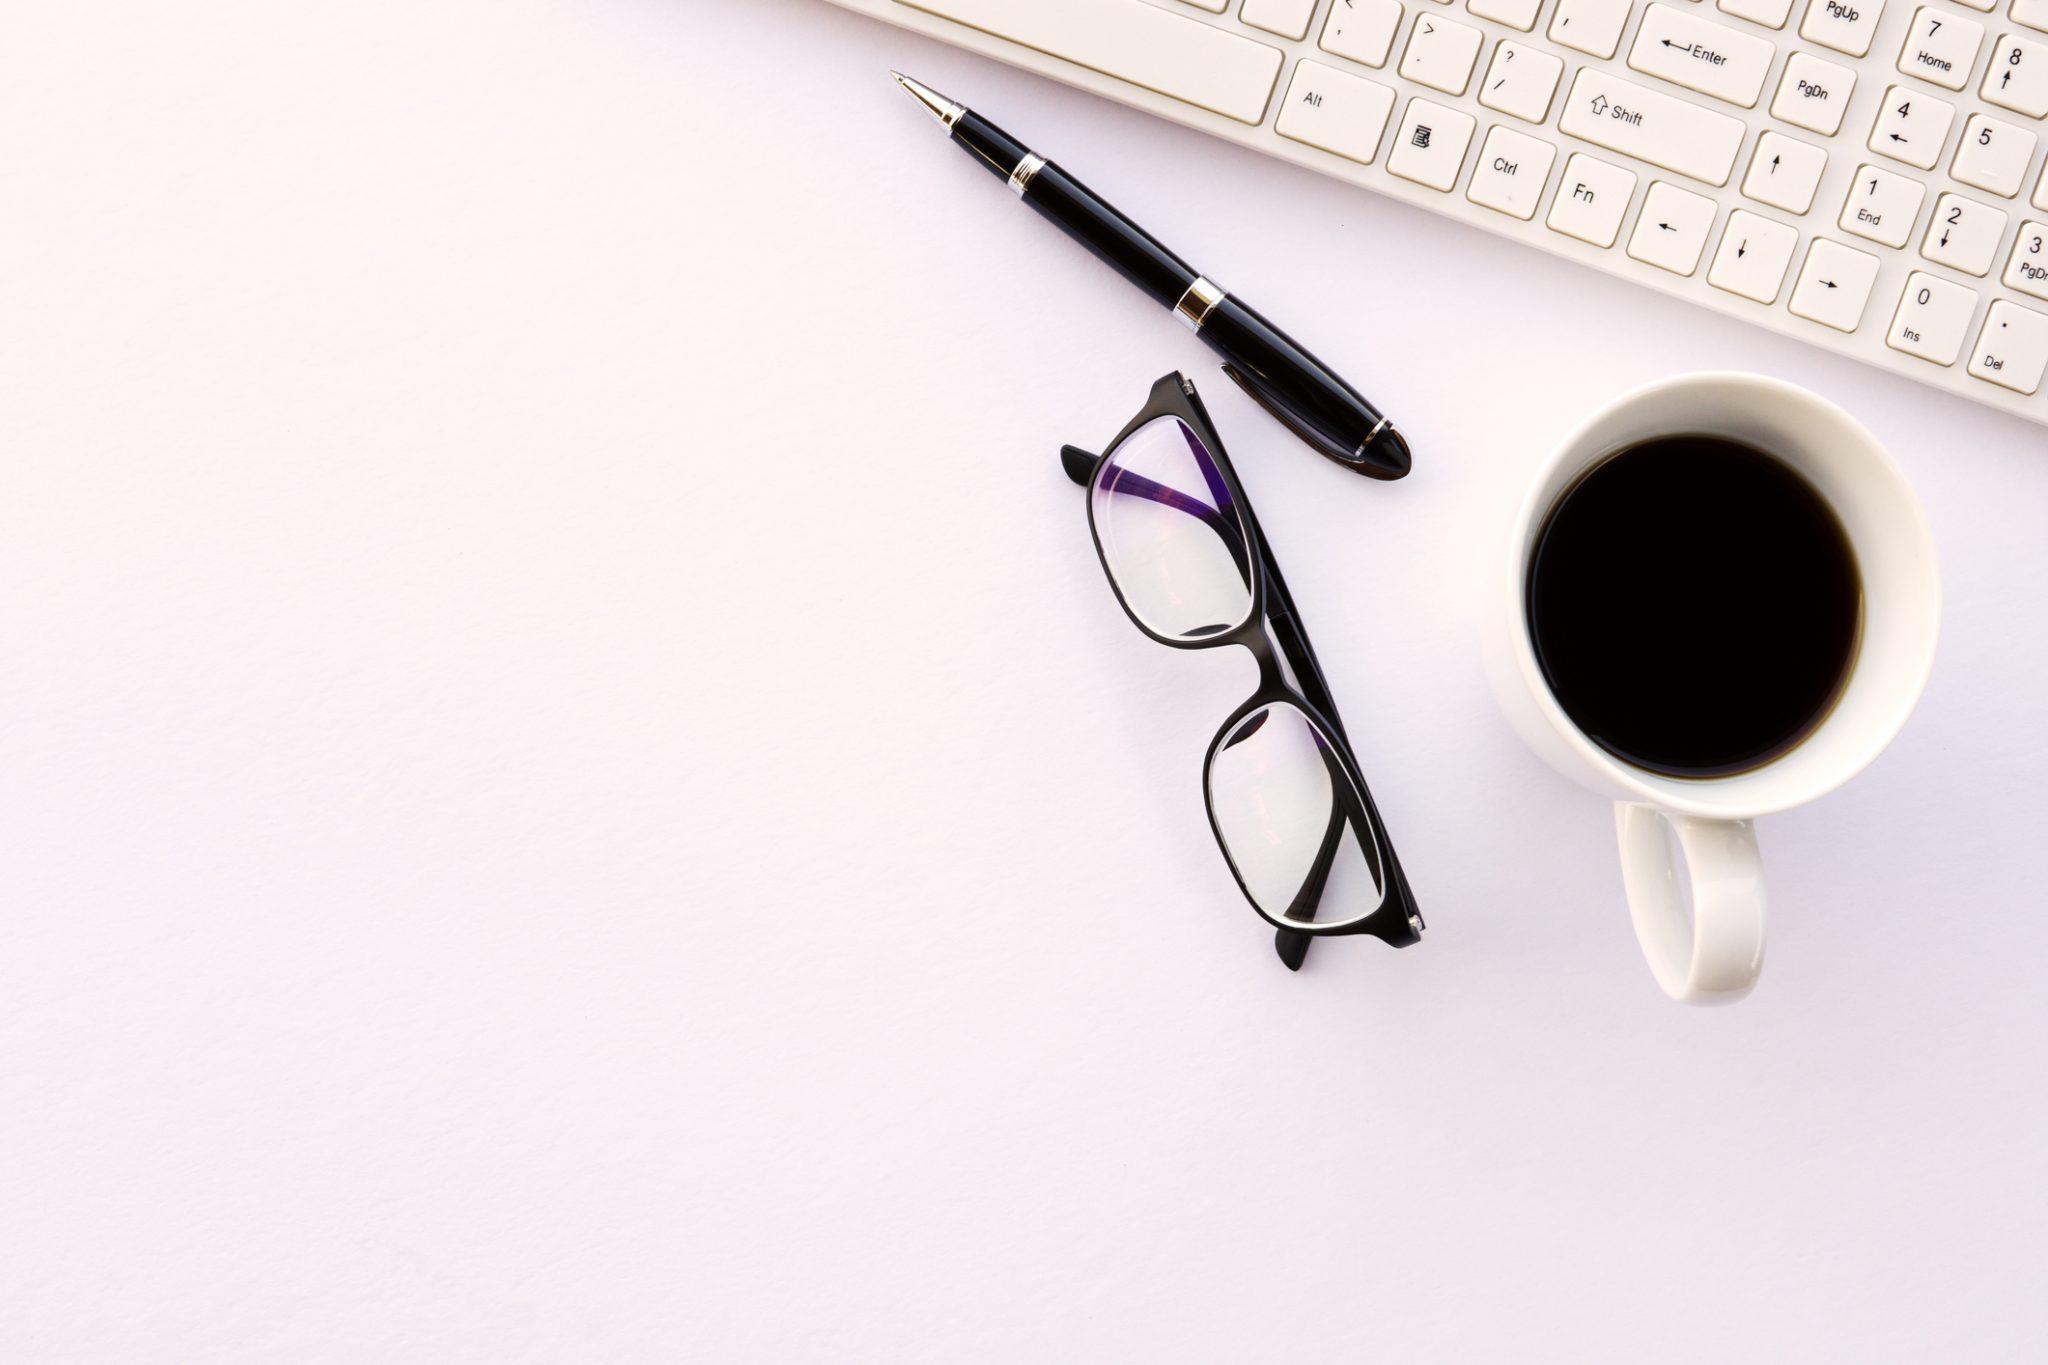 Kurs i Avancerad Rapportering - Affärssystem ERP - Xledger